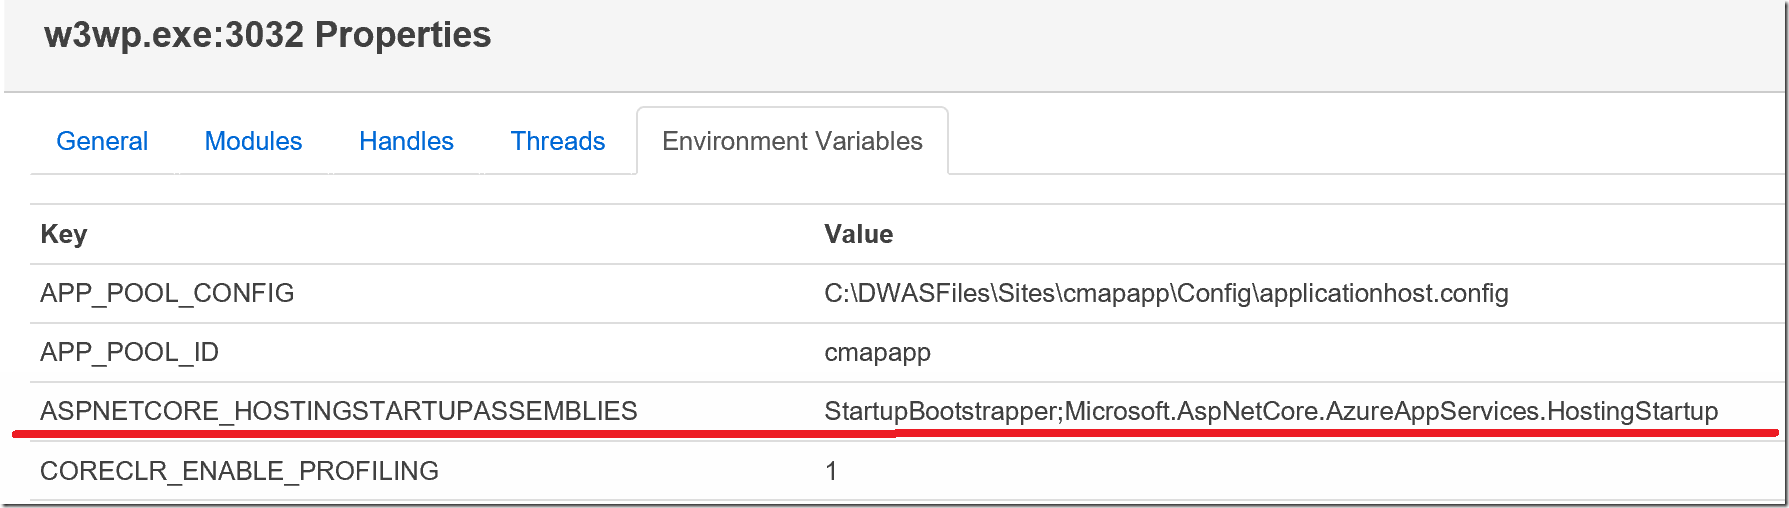 Azure App Service Worker Process Environment Variables